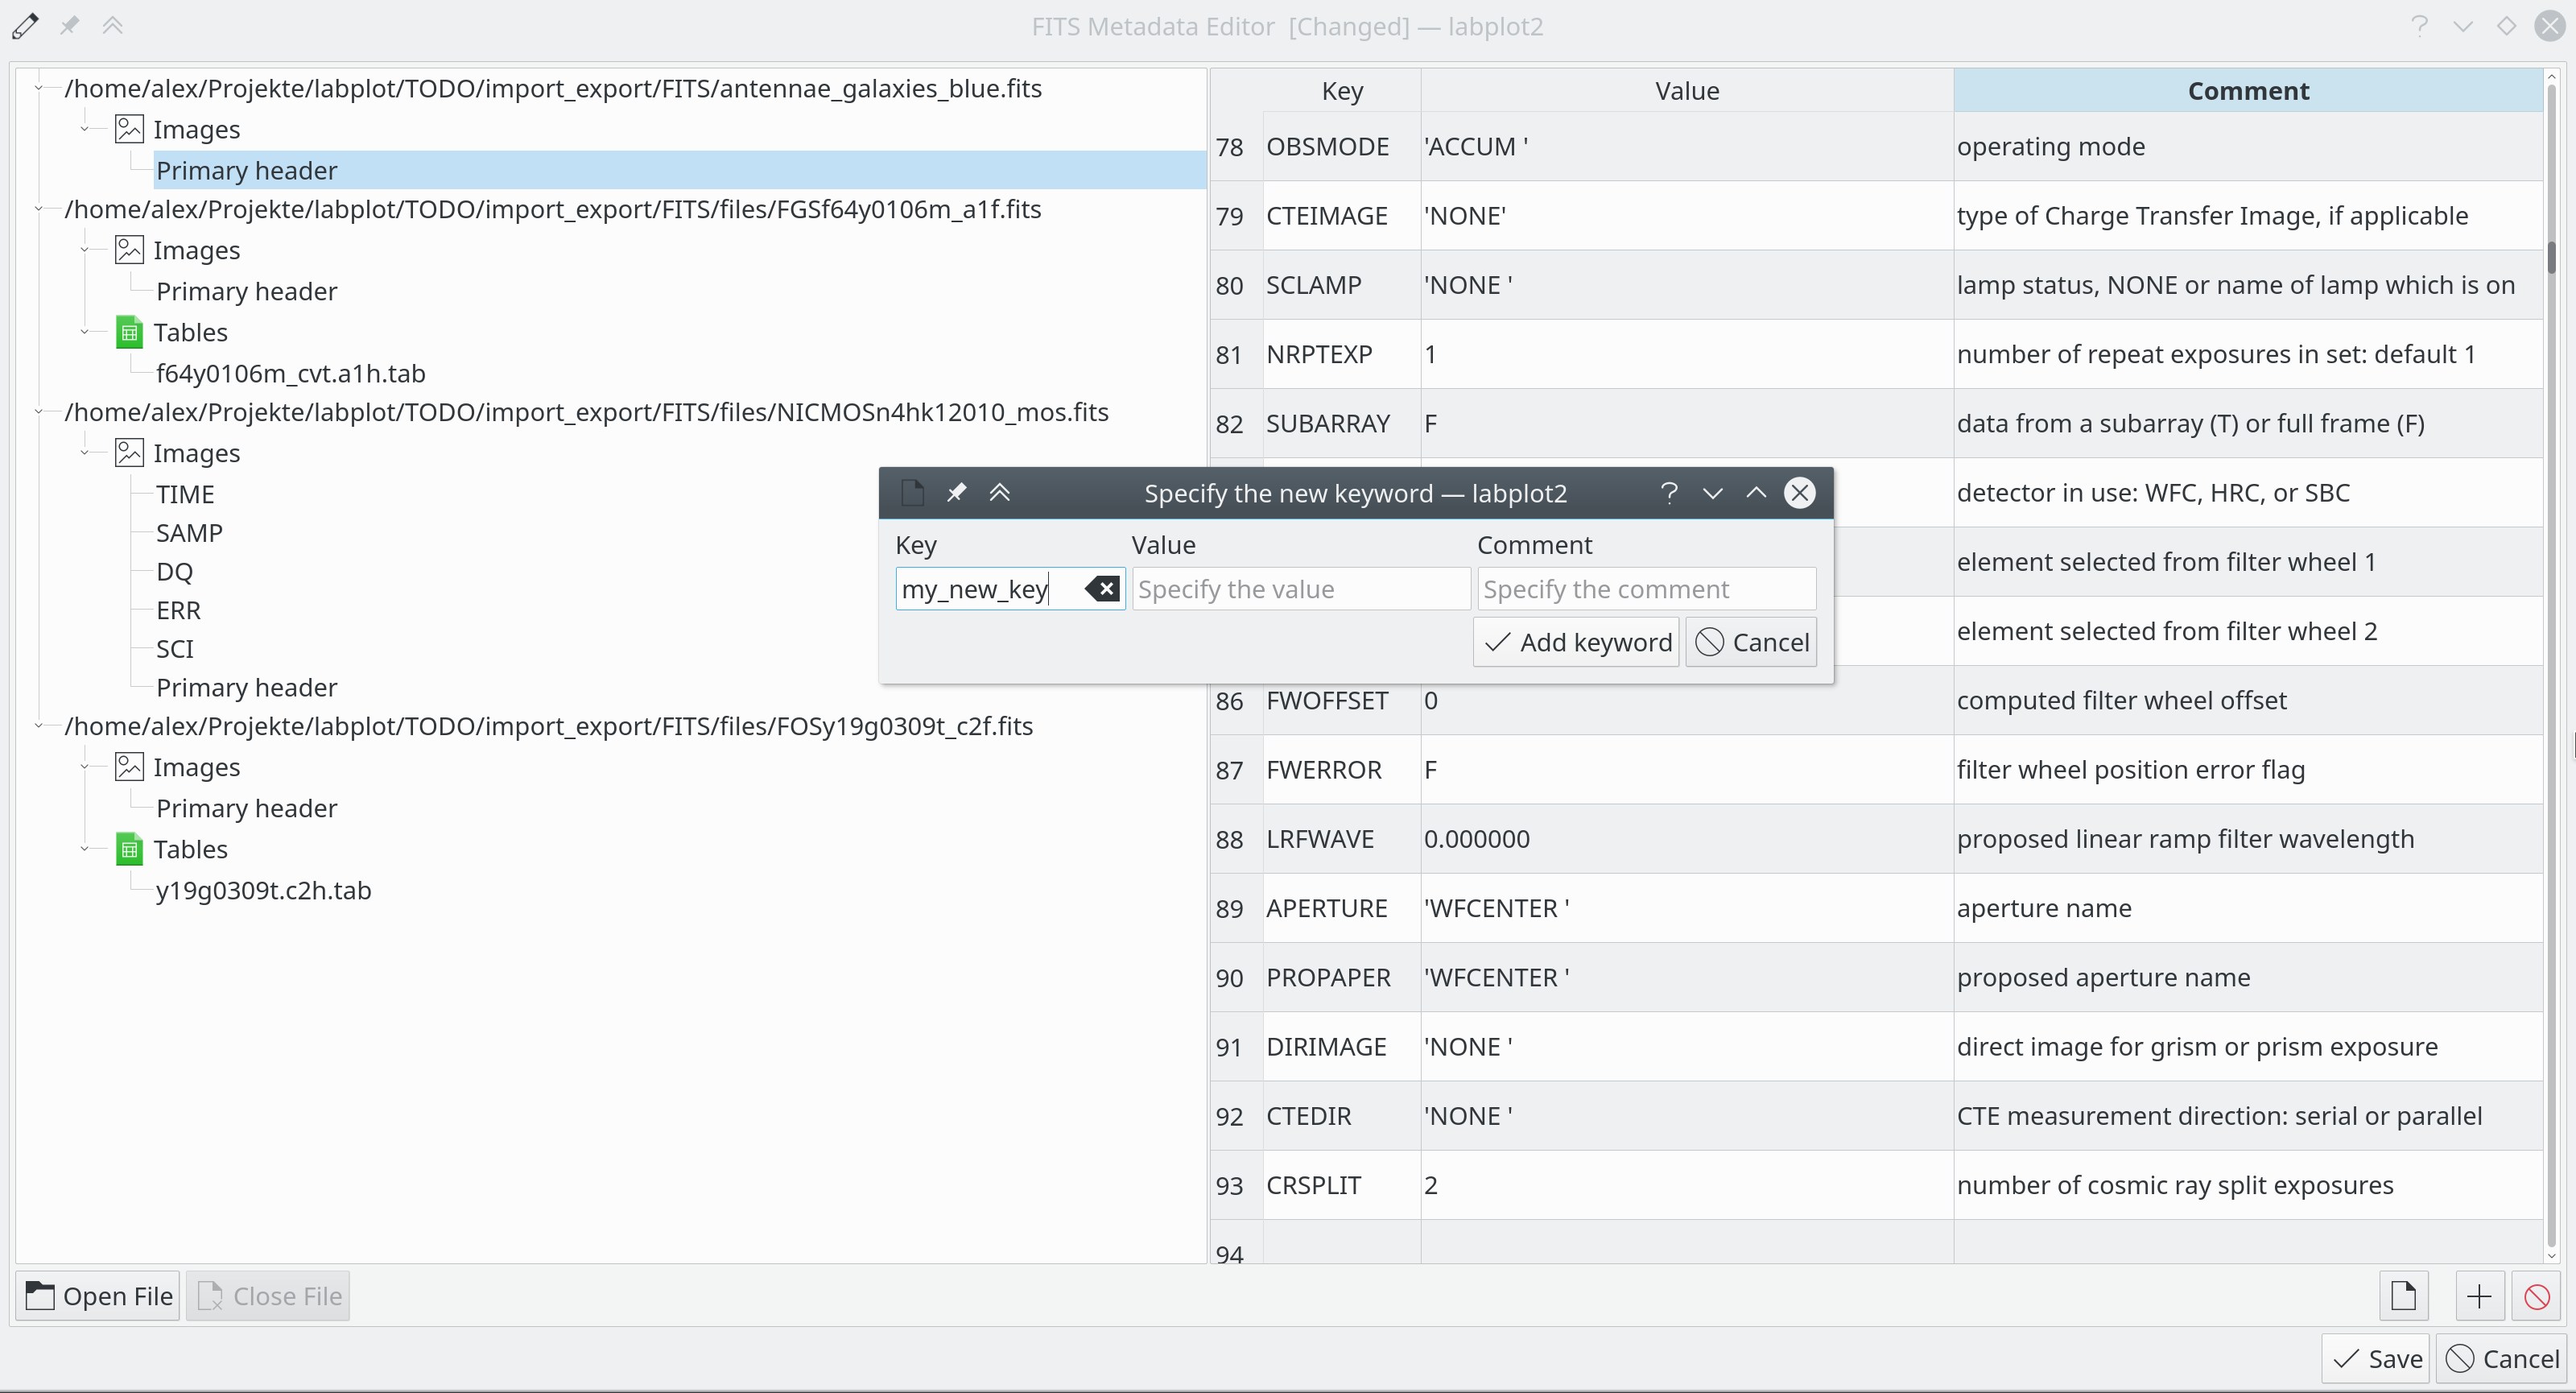 FITS Metadata Editor